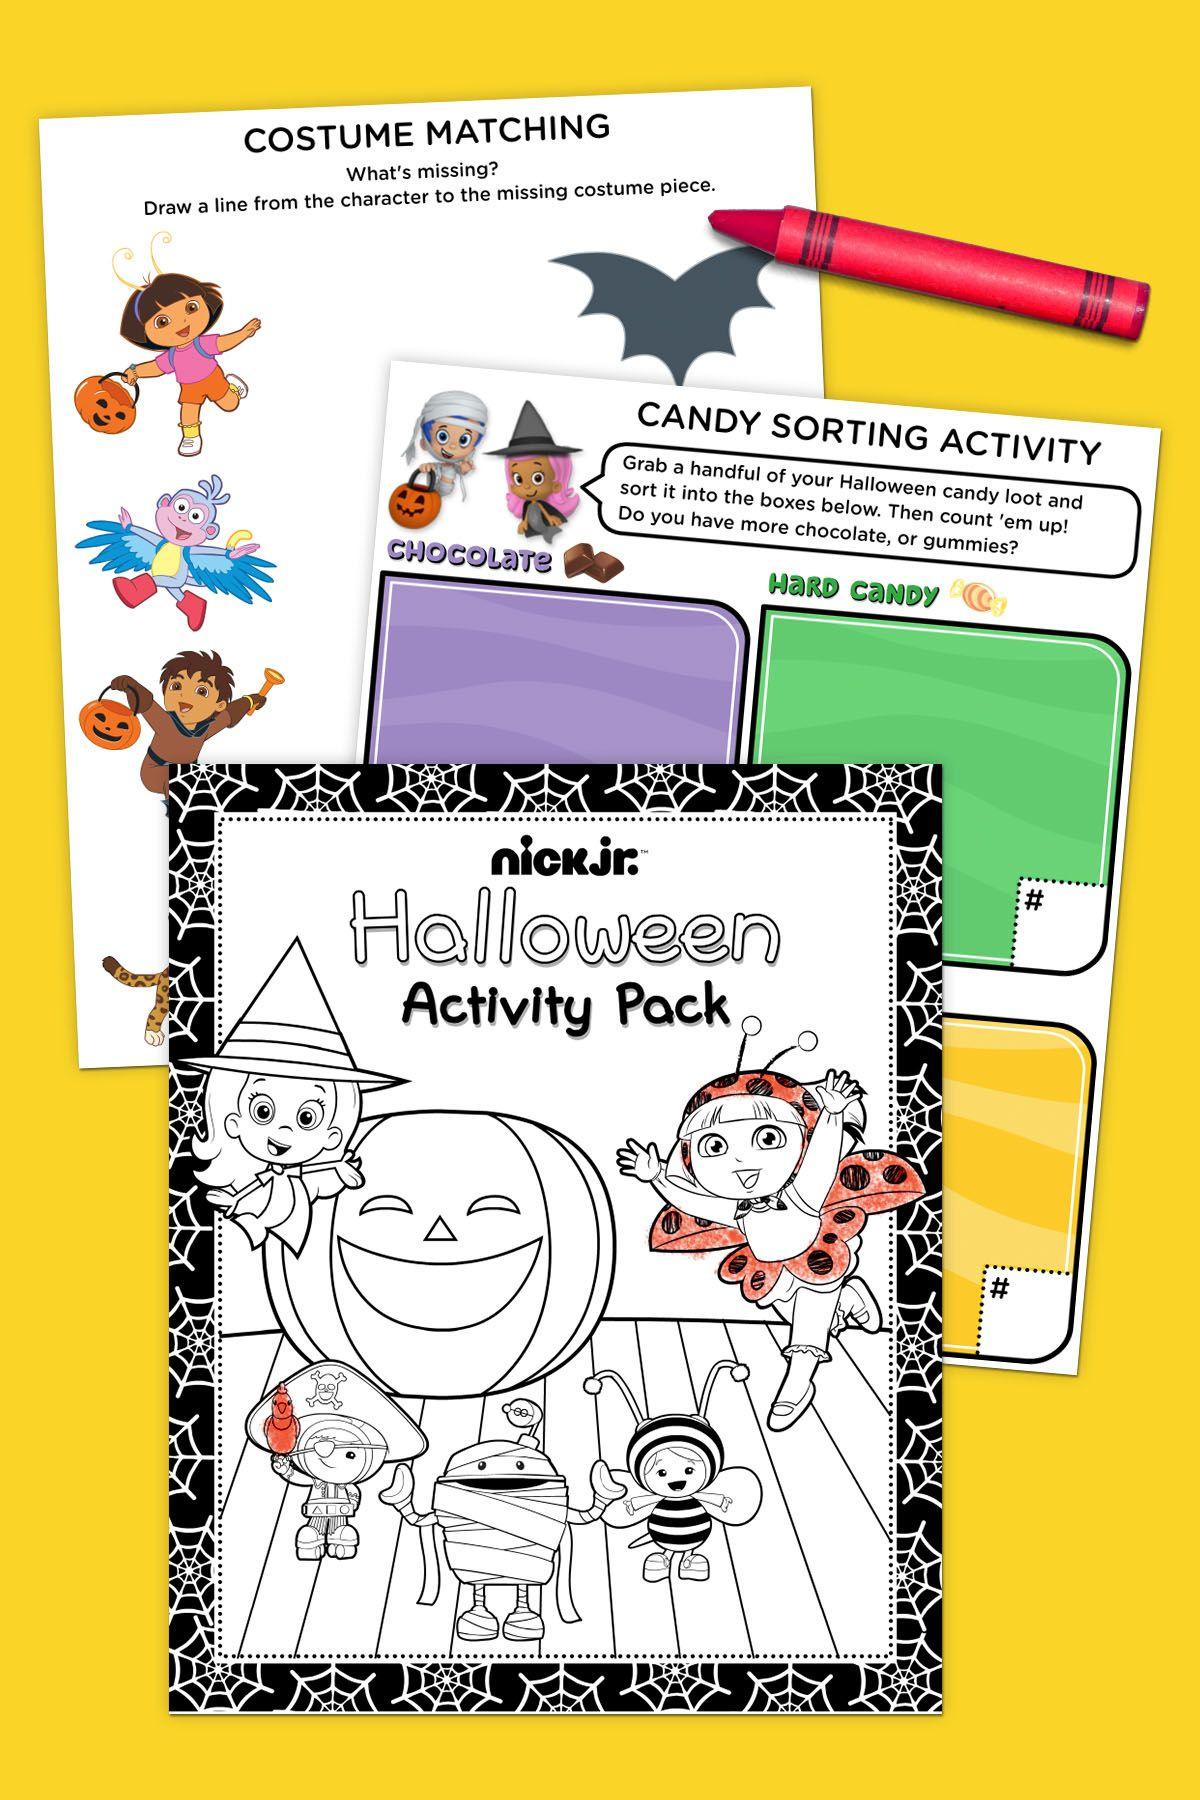 Nick Jr. Halloween Activity Pack | Nick jr